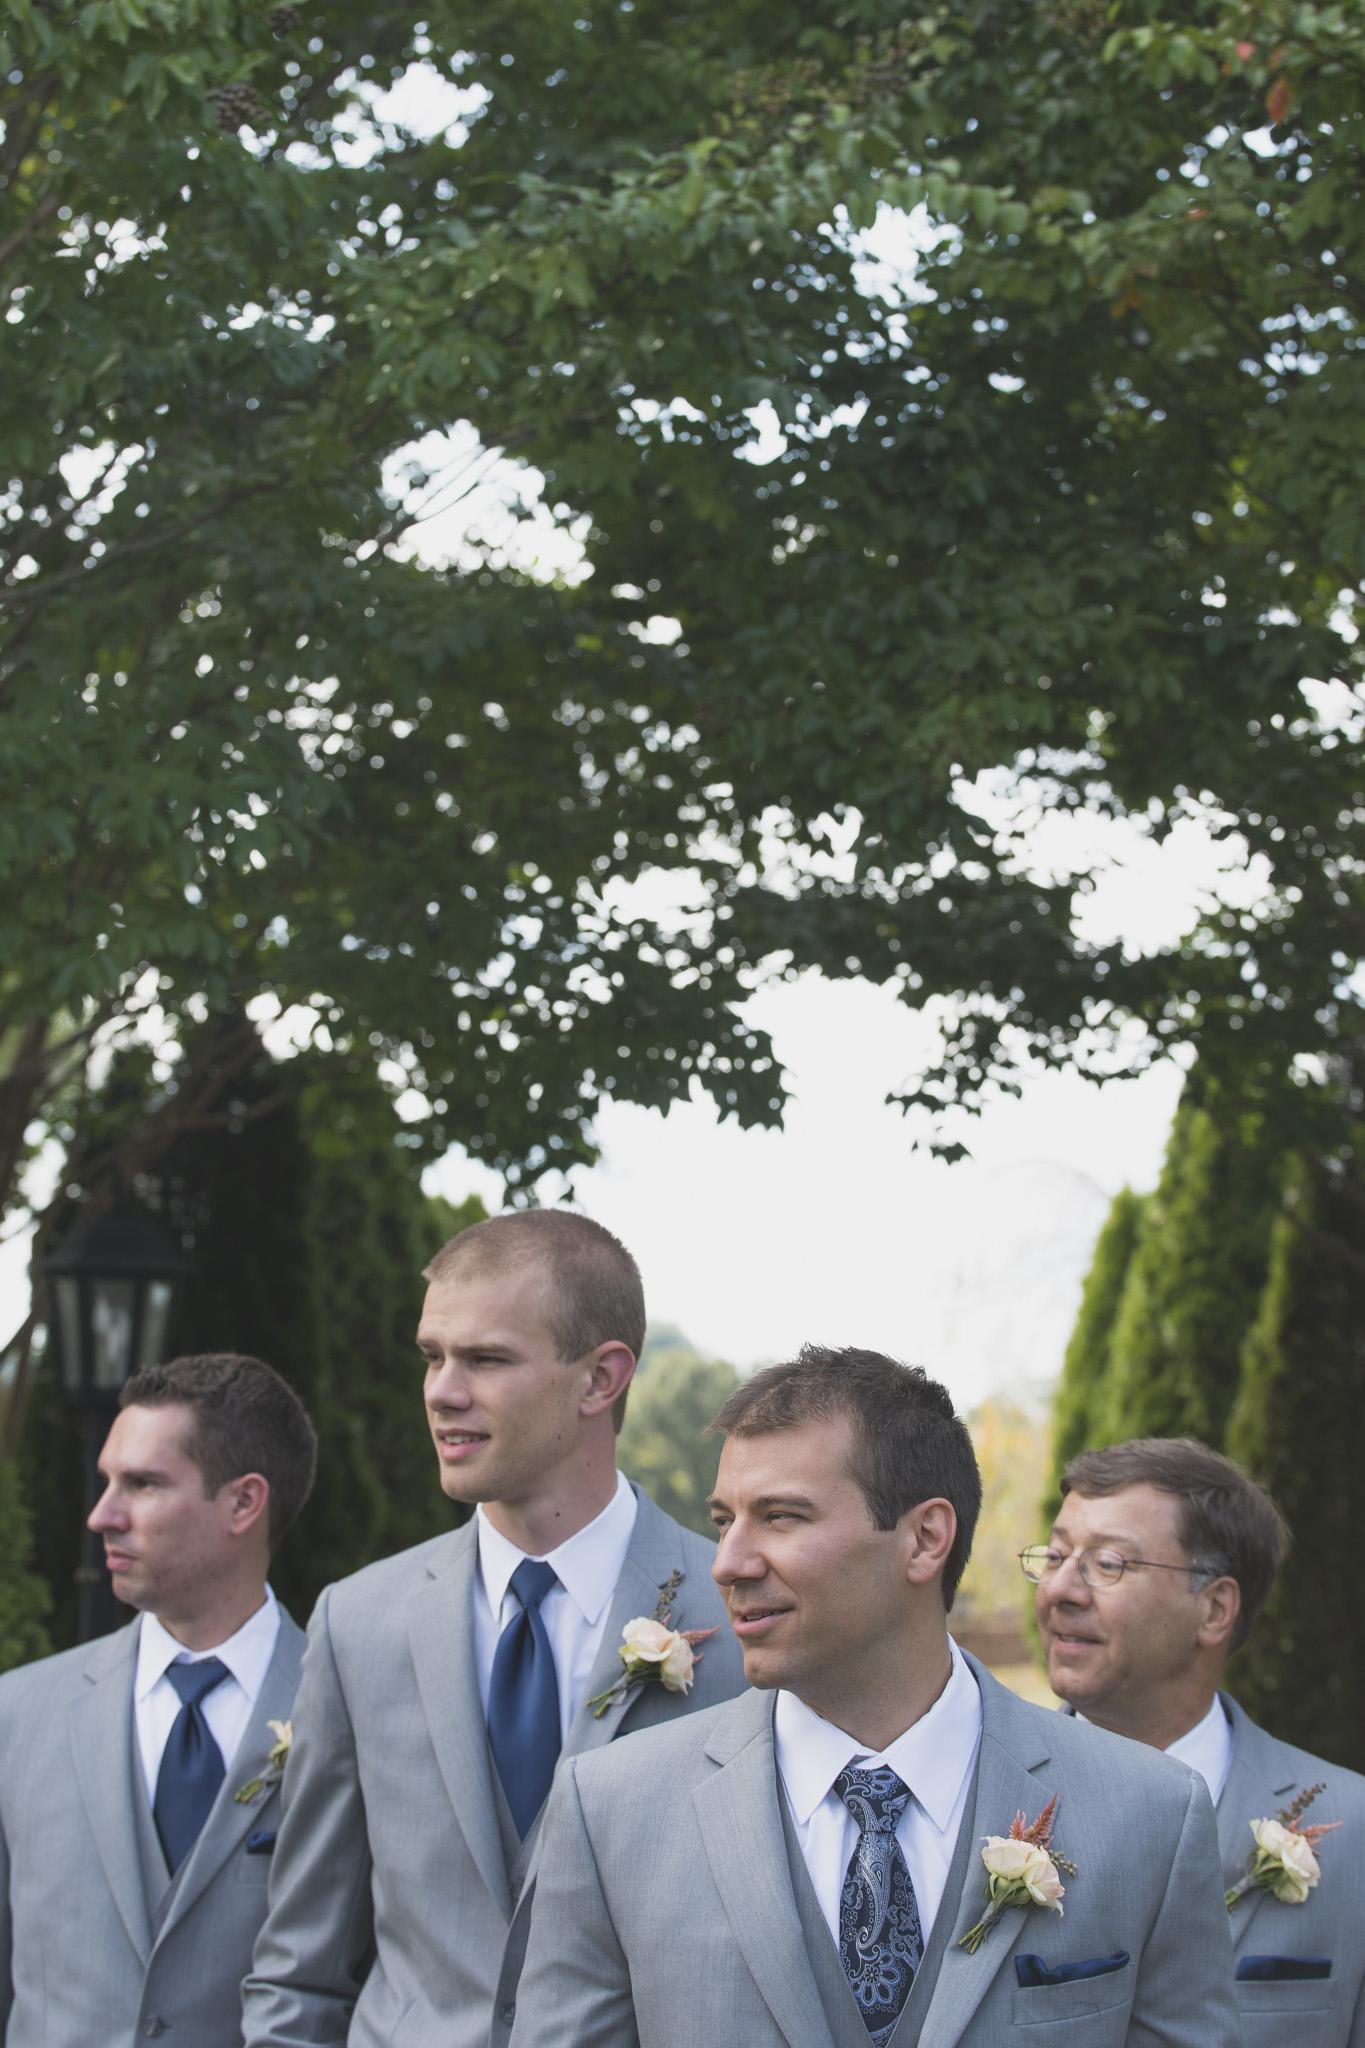 West Manor Wedding_Lynchburg VA_Classic_Black tie_Forest VA_Wedding_photos2030.jpg